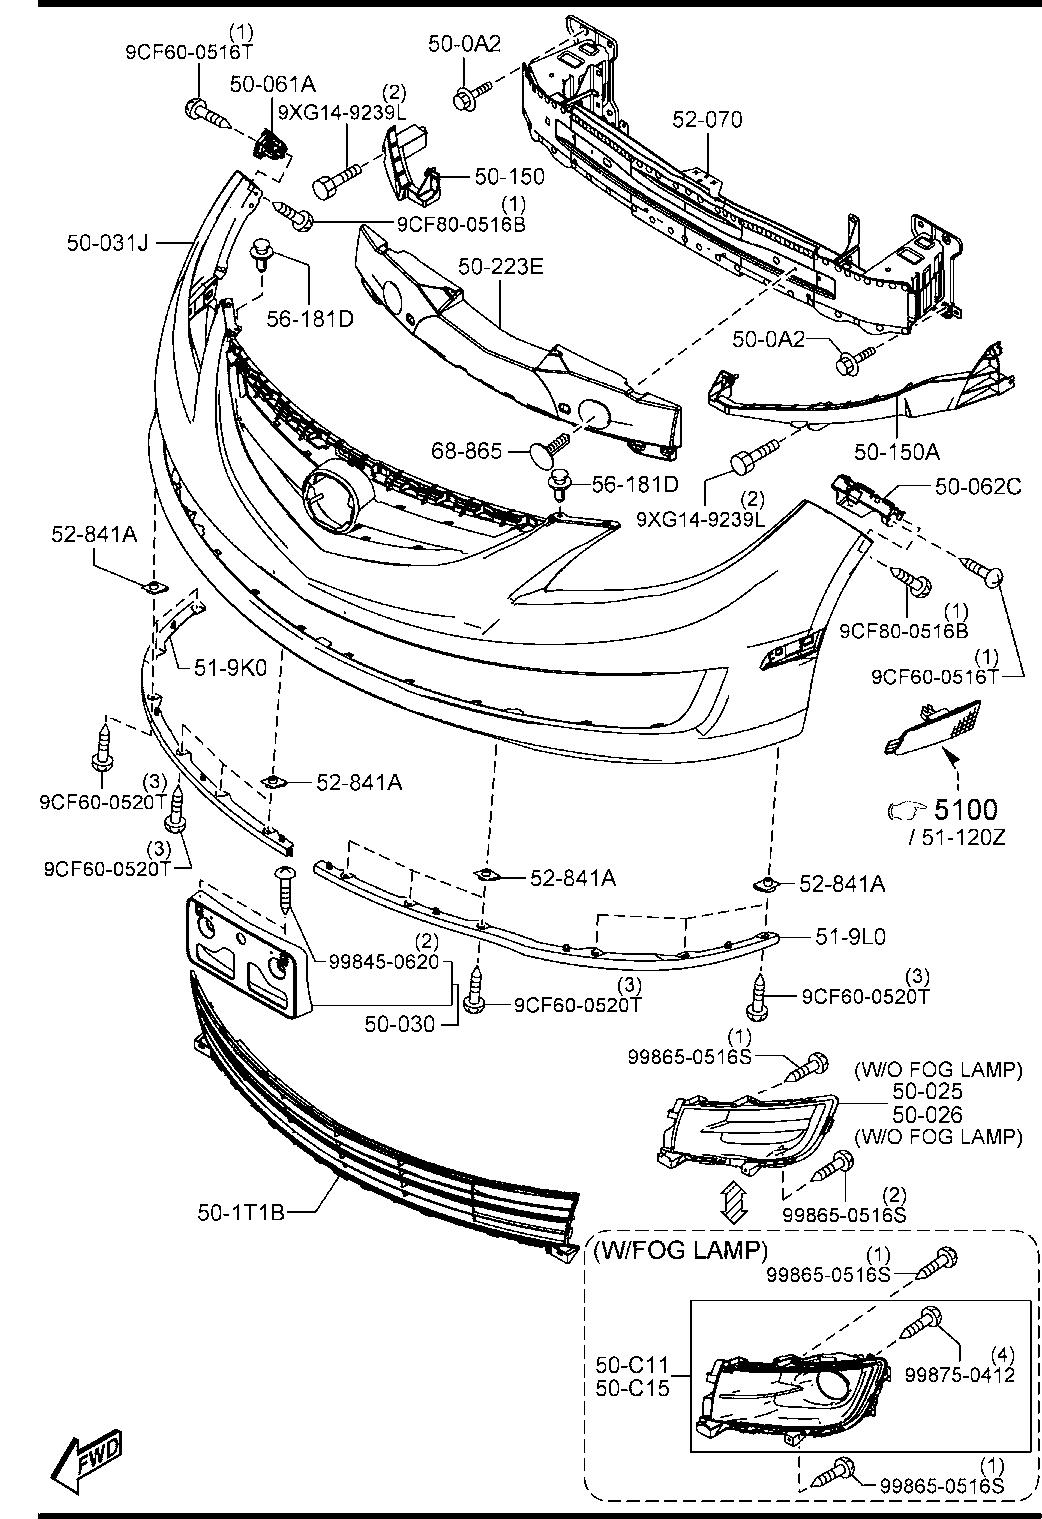 Diagram Mazda 6 User Wiring Diagram Full Version Hd